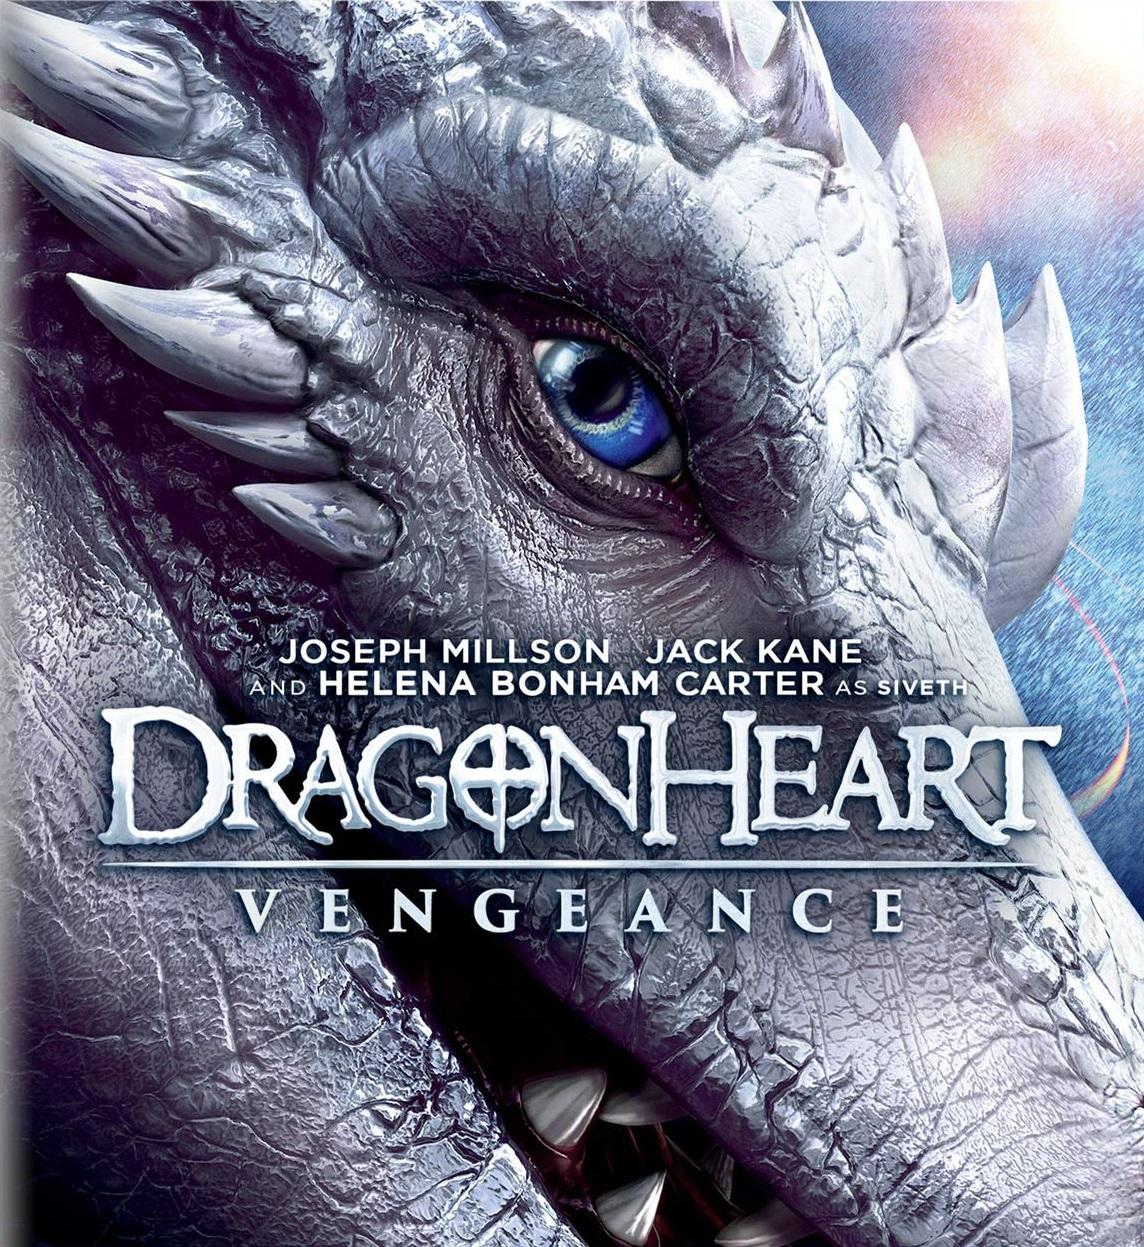 DRAKONO ŠIRDIS 5. KERŠTAS (2020) / Dragonheart Vengeance